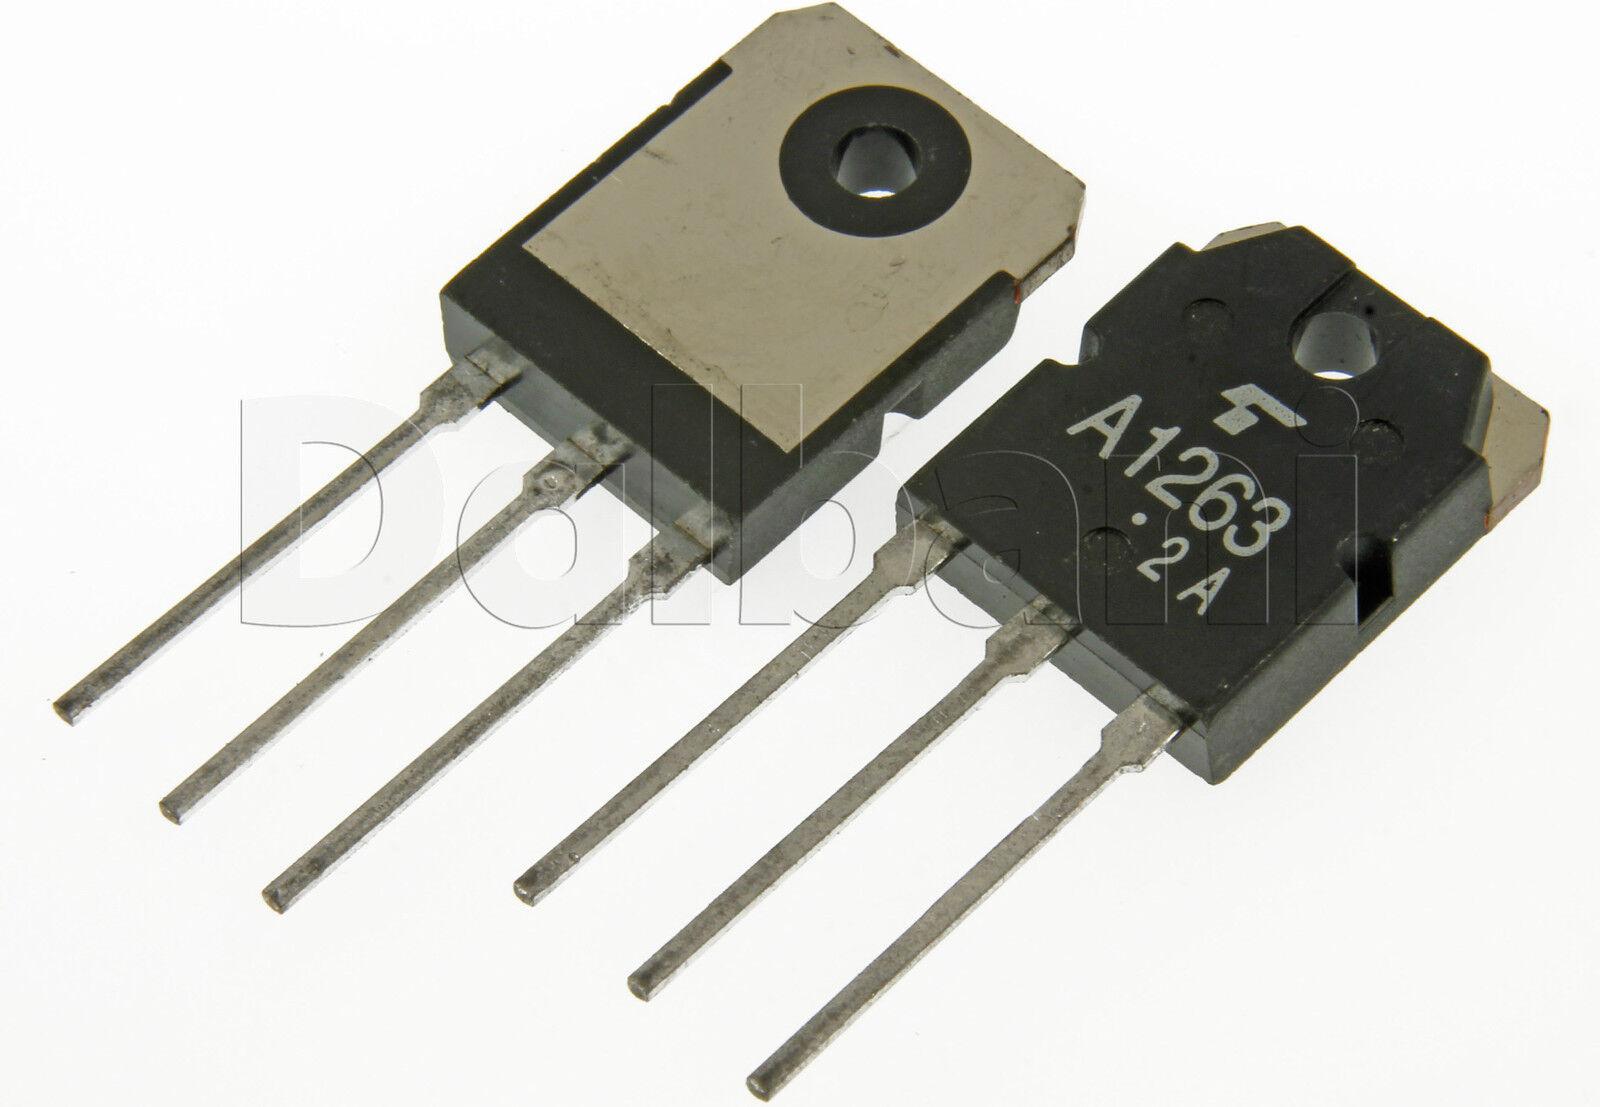 2sa1263n Original Toshiba Pnp To 218 80v 6a 60w Transistor A1263n Ebay Inverter Using Transistors Norton Secured Powered By Verisign